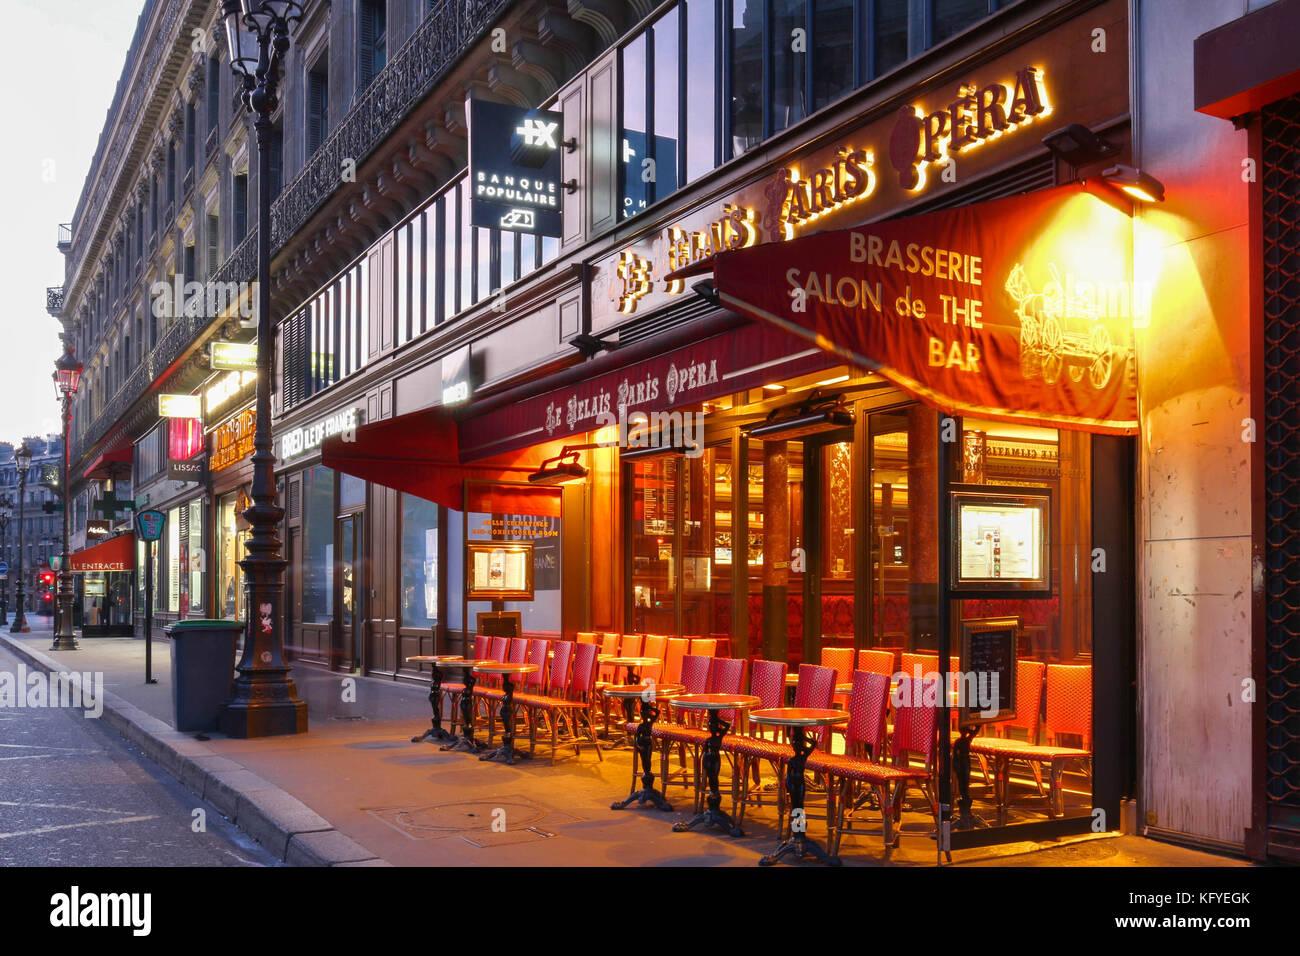 The traditional Parisian cafe Le relais Paris Opera located near Opera palace Garnier in Paris, France. Stock Photo